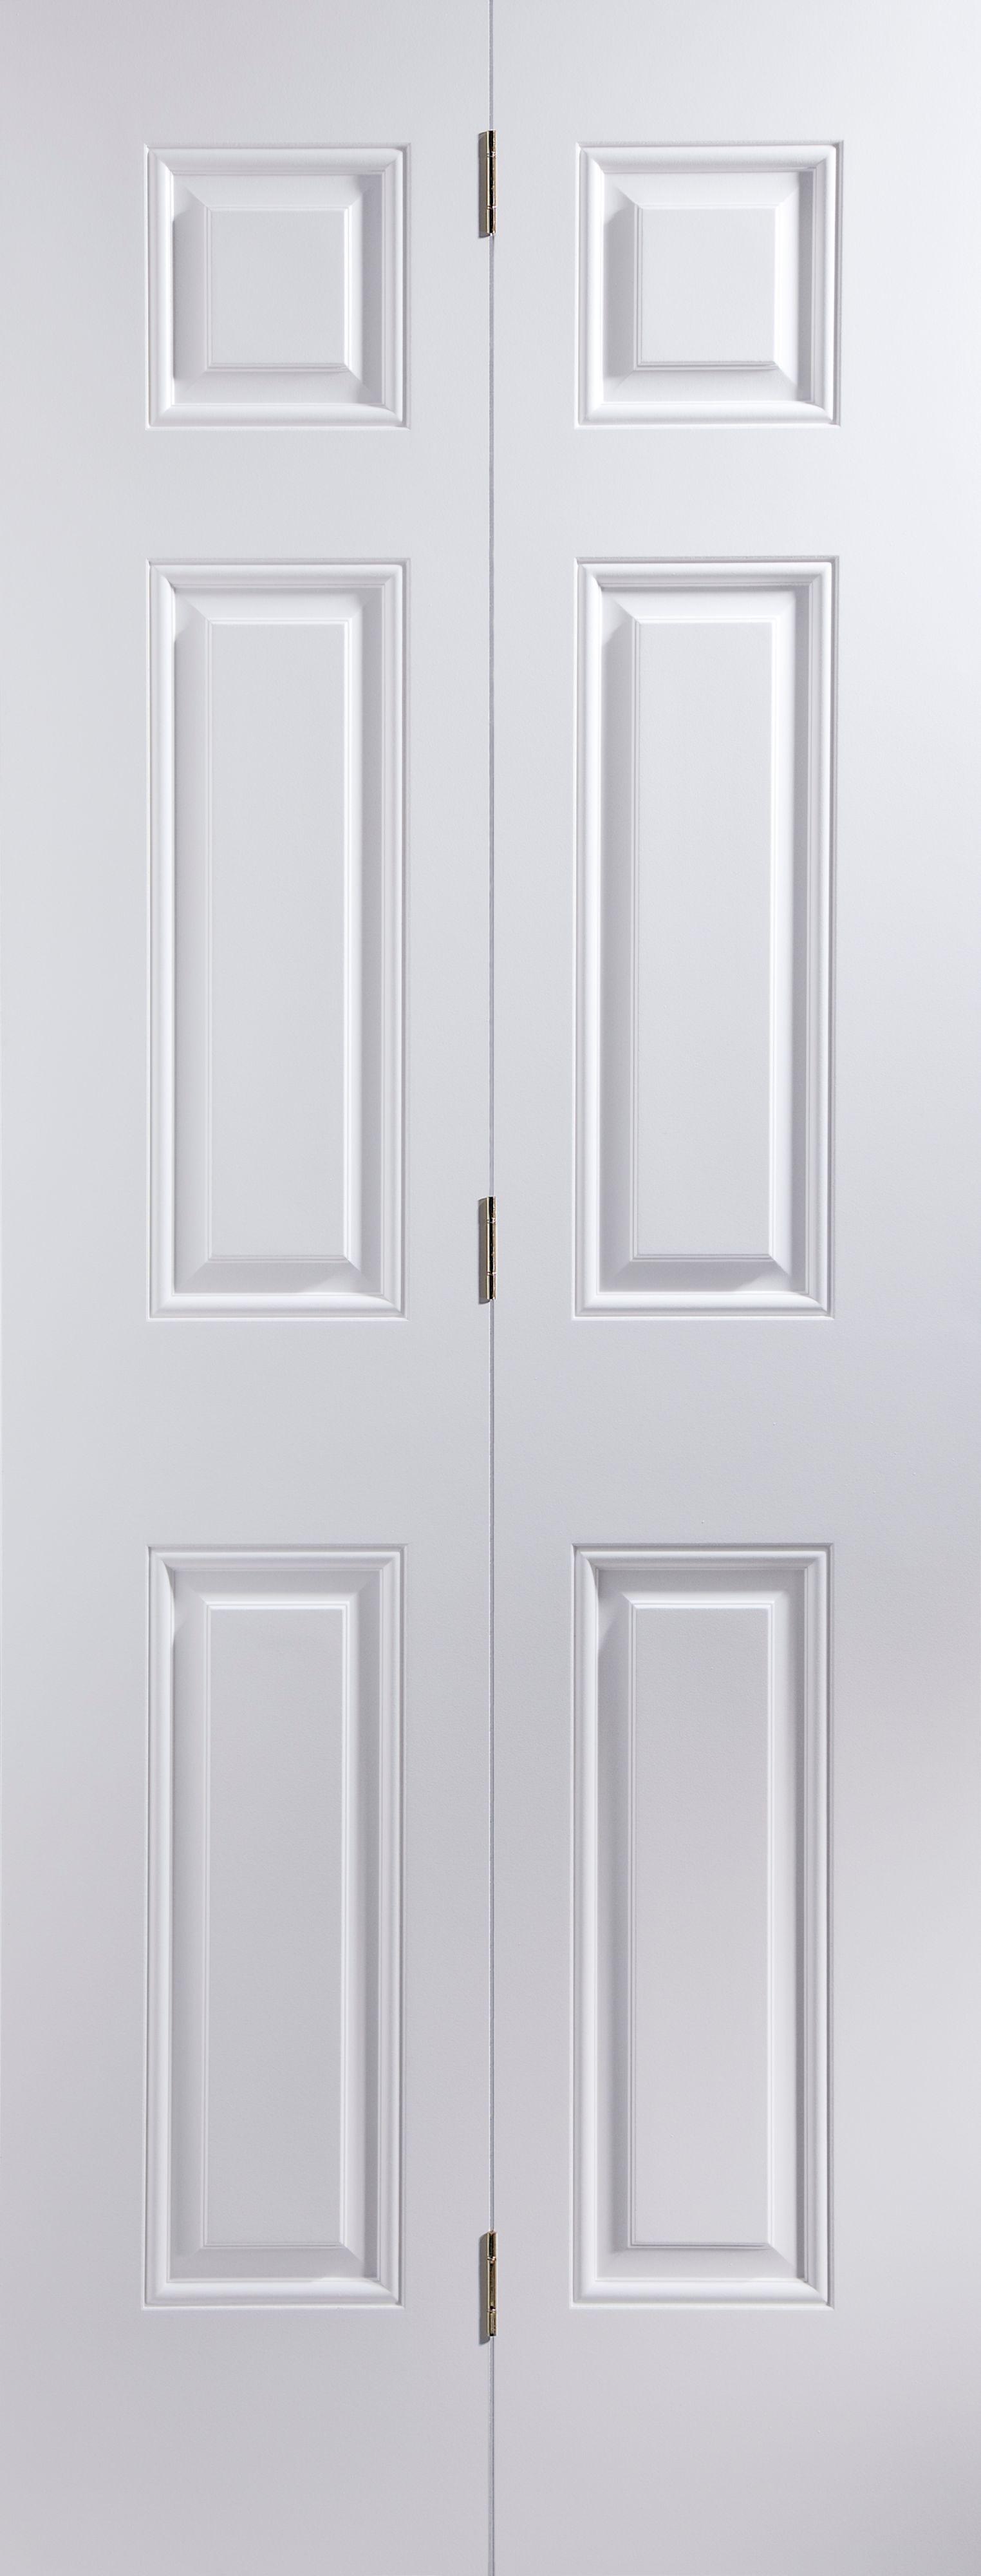 6 Panel Primed Smooth Glazed Internal Bi-fold Door, (h)1950mm (w)762mm